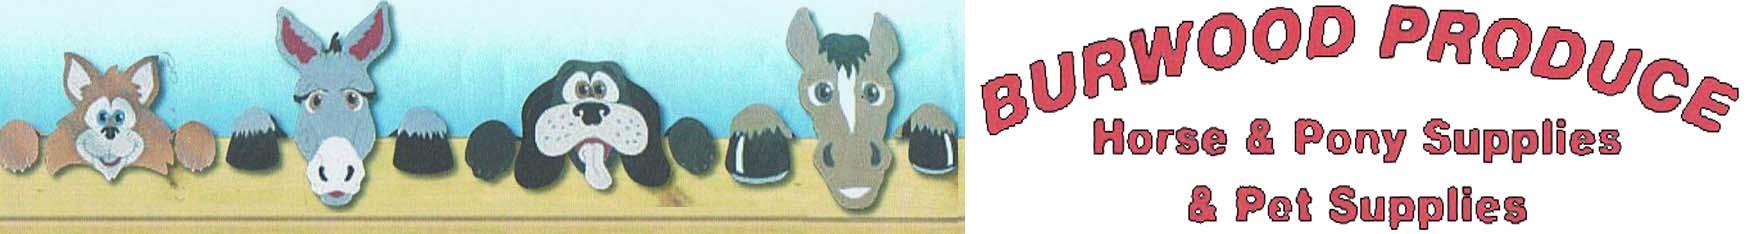 Burwood Produce Horse & pony pet supplies